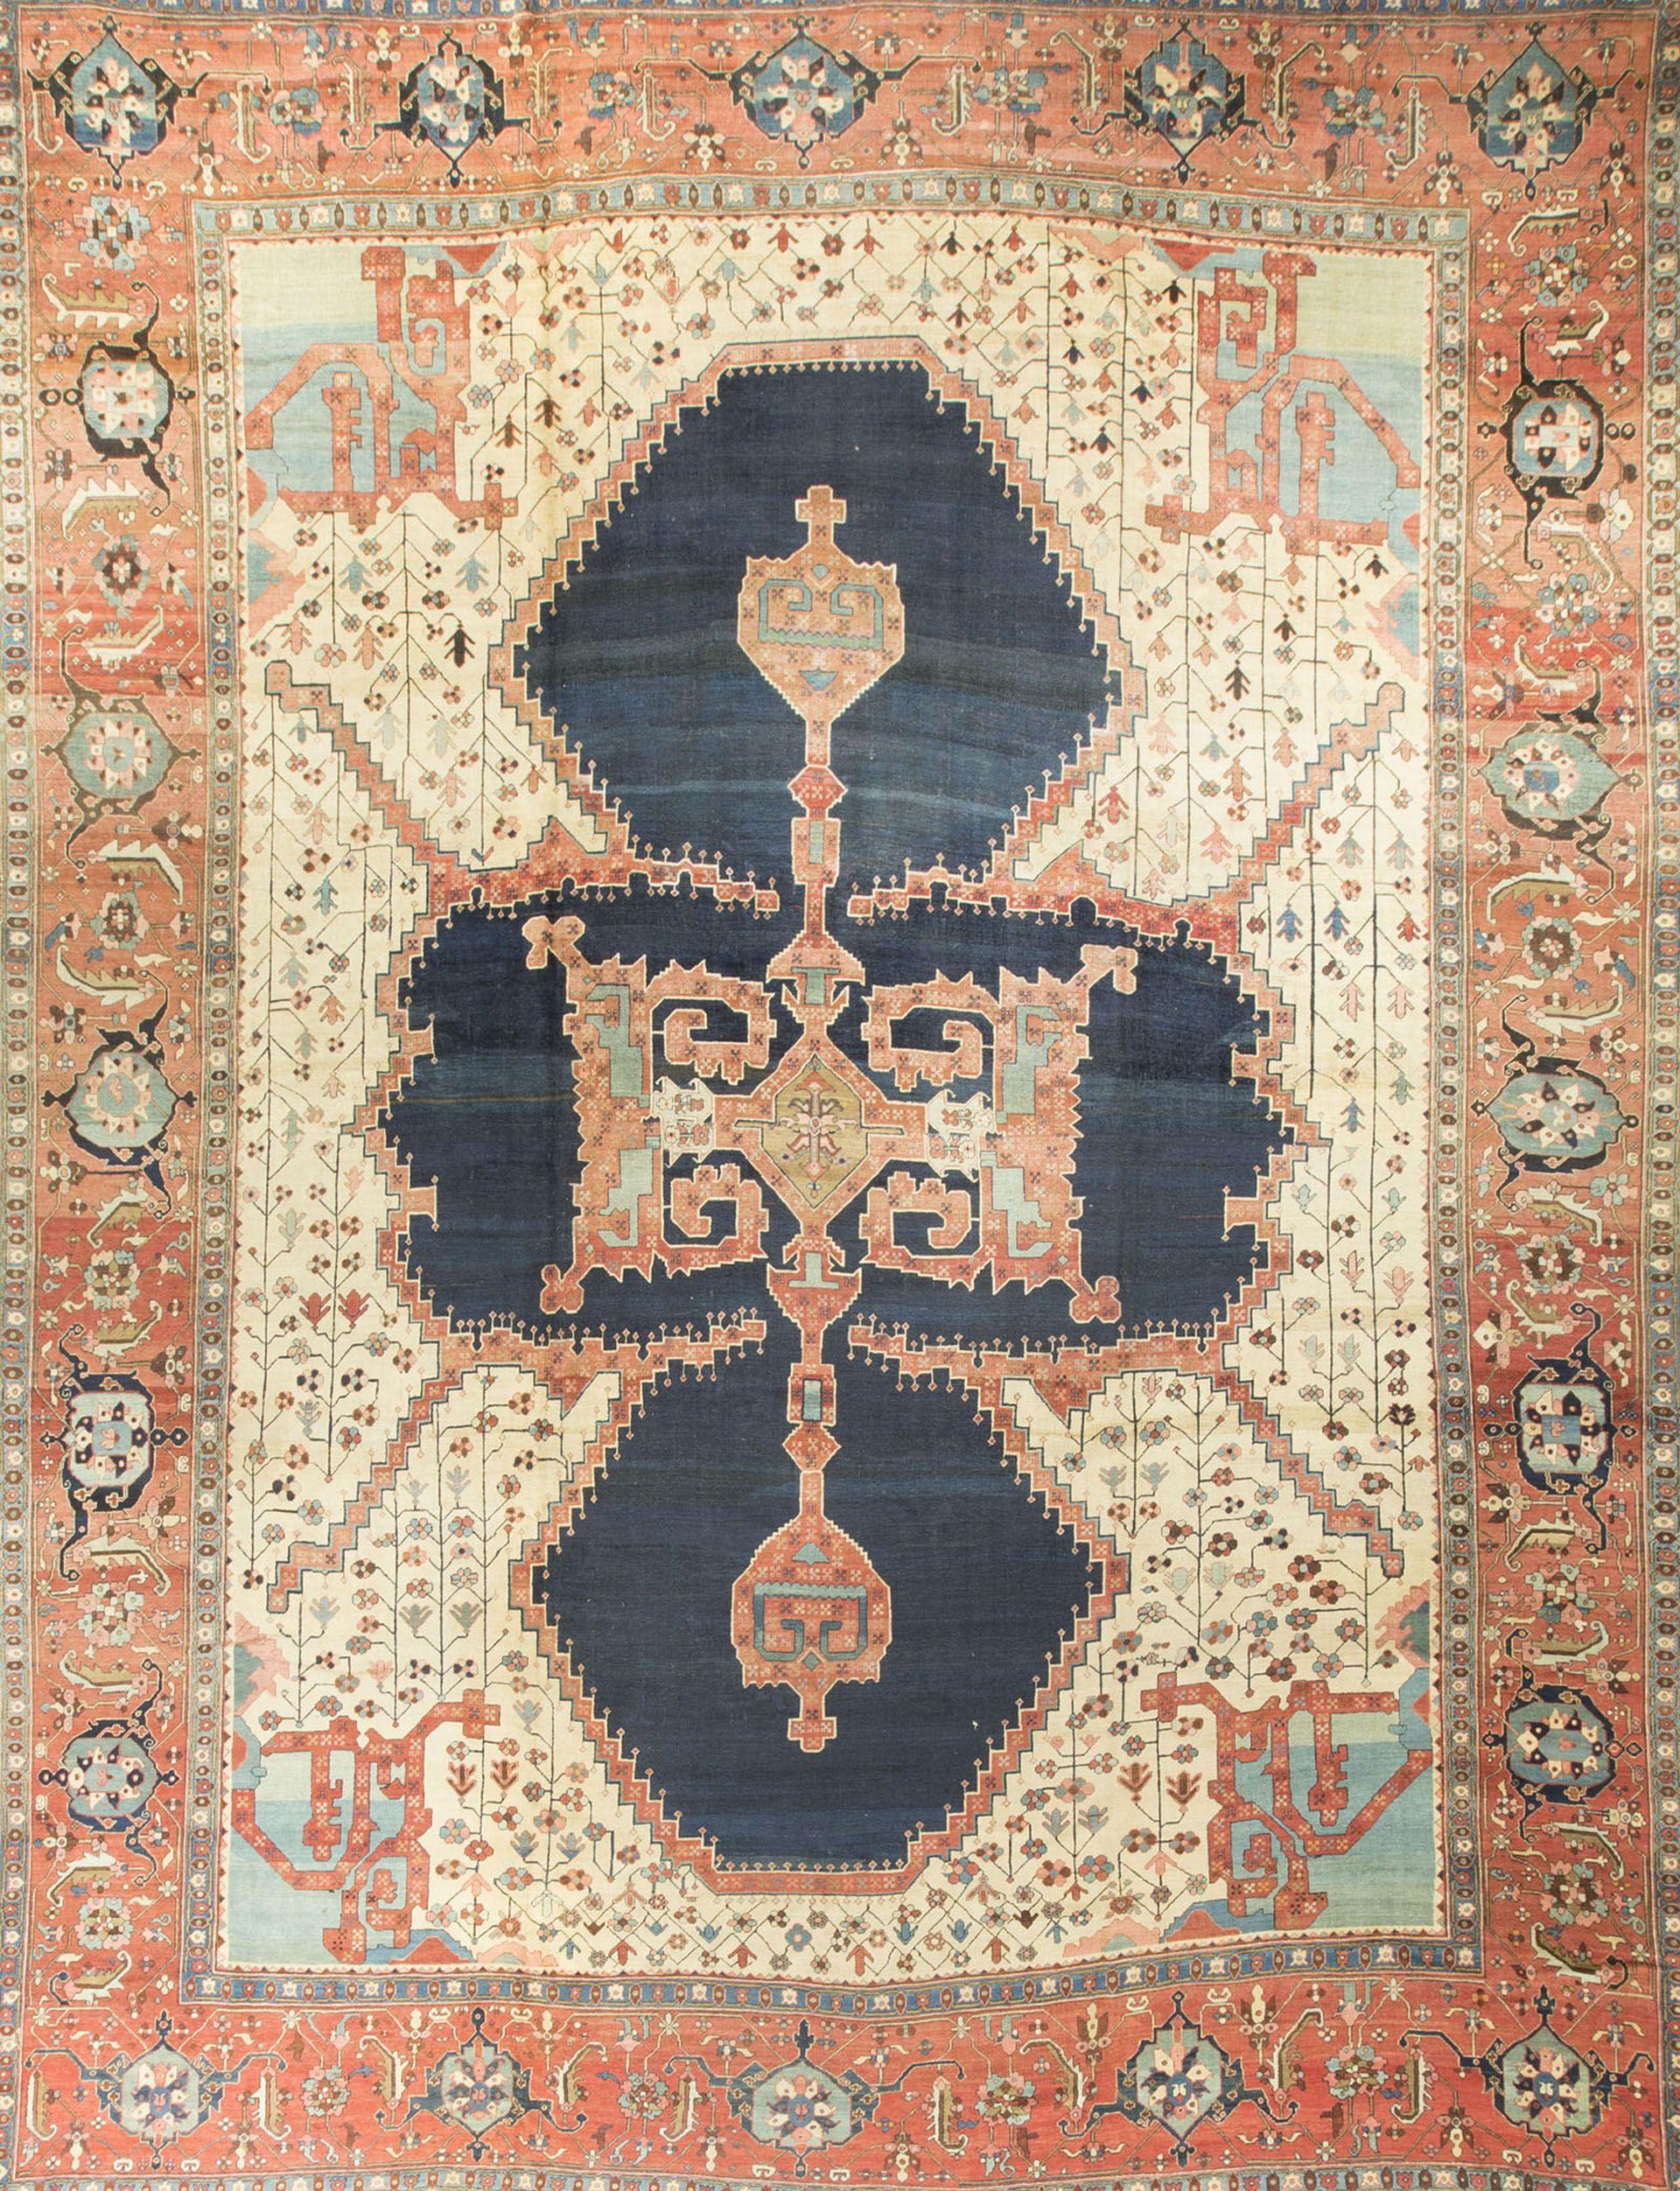 Antique Heriz Serapi Rug Circa 1890 15 10 X 20 In 2019 Persian